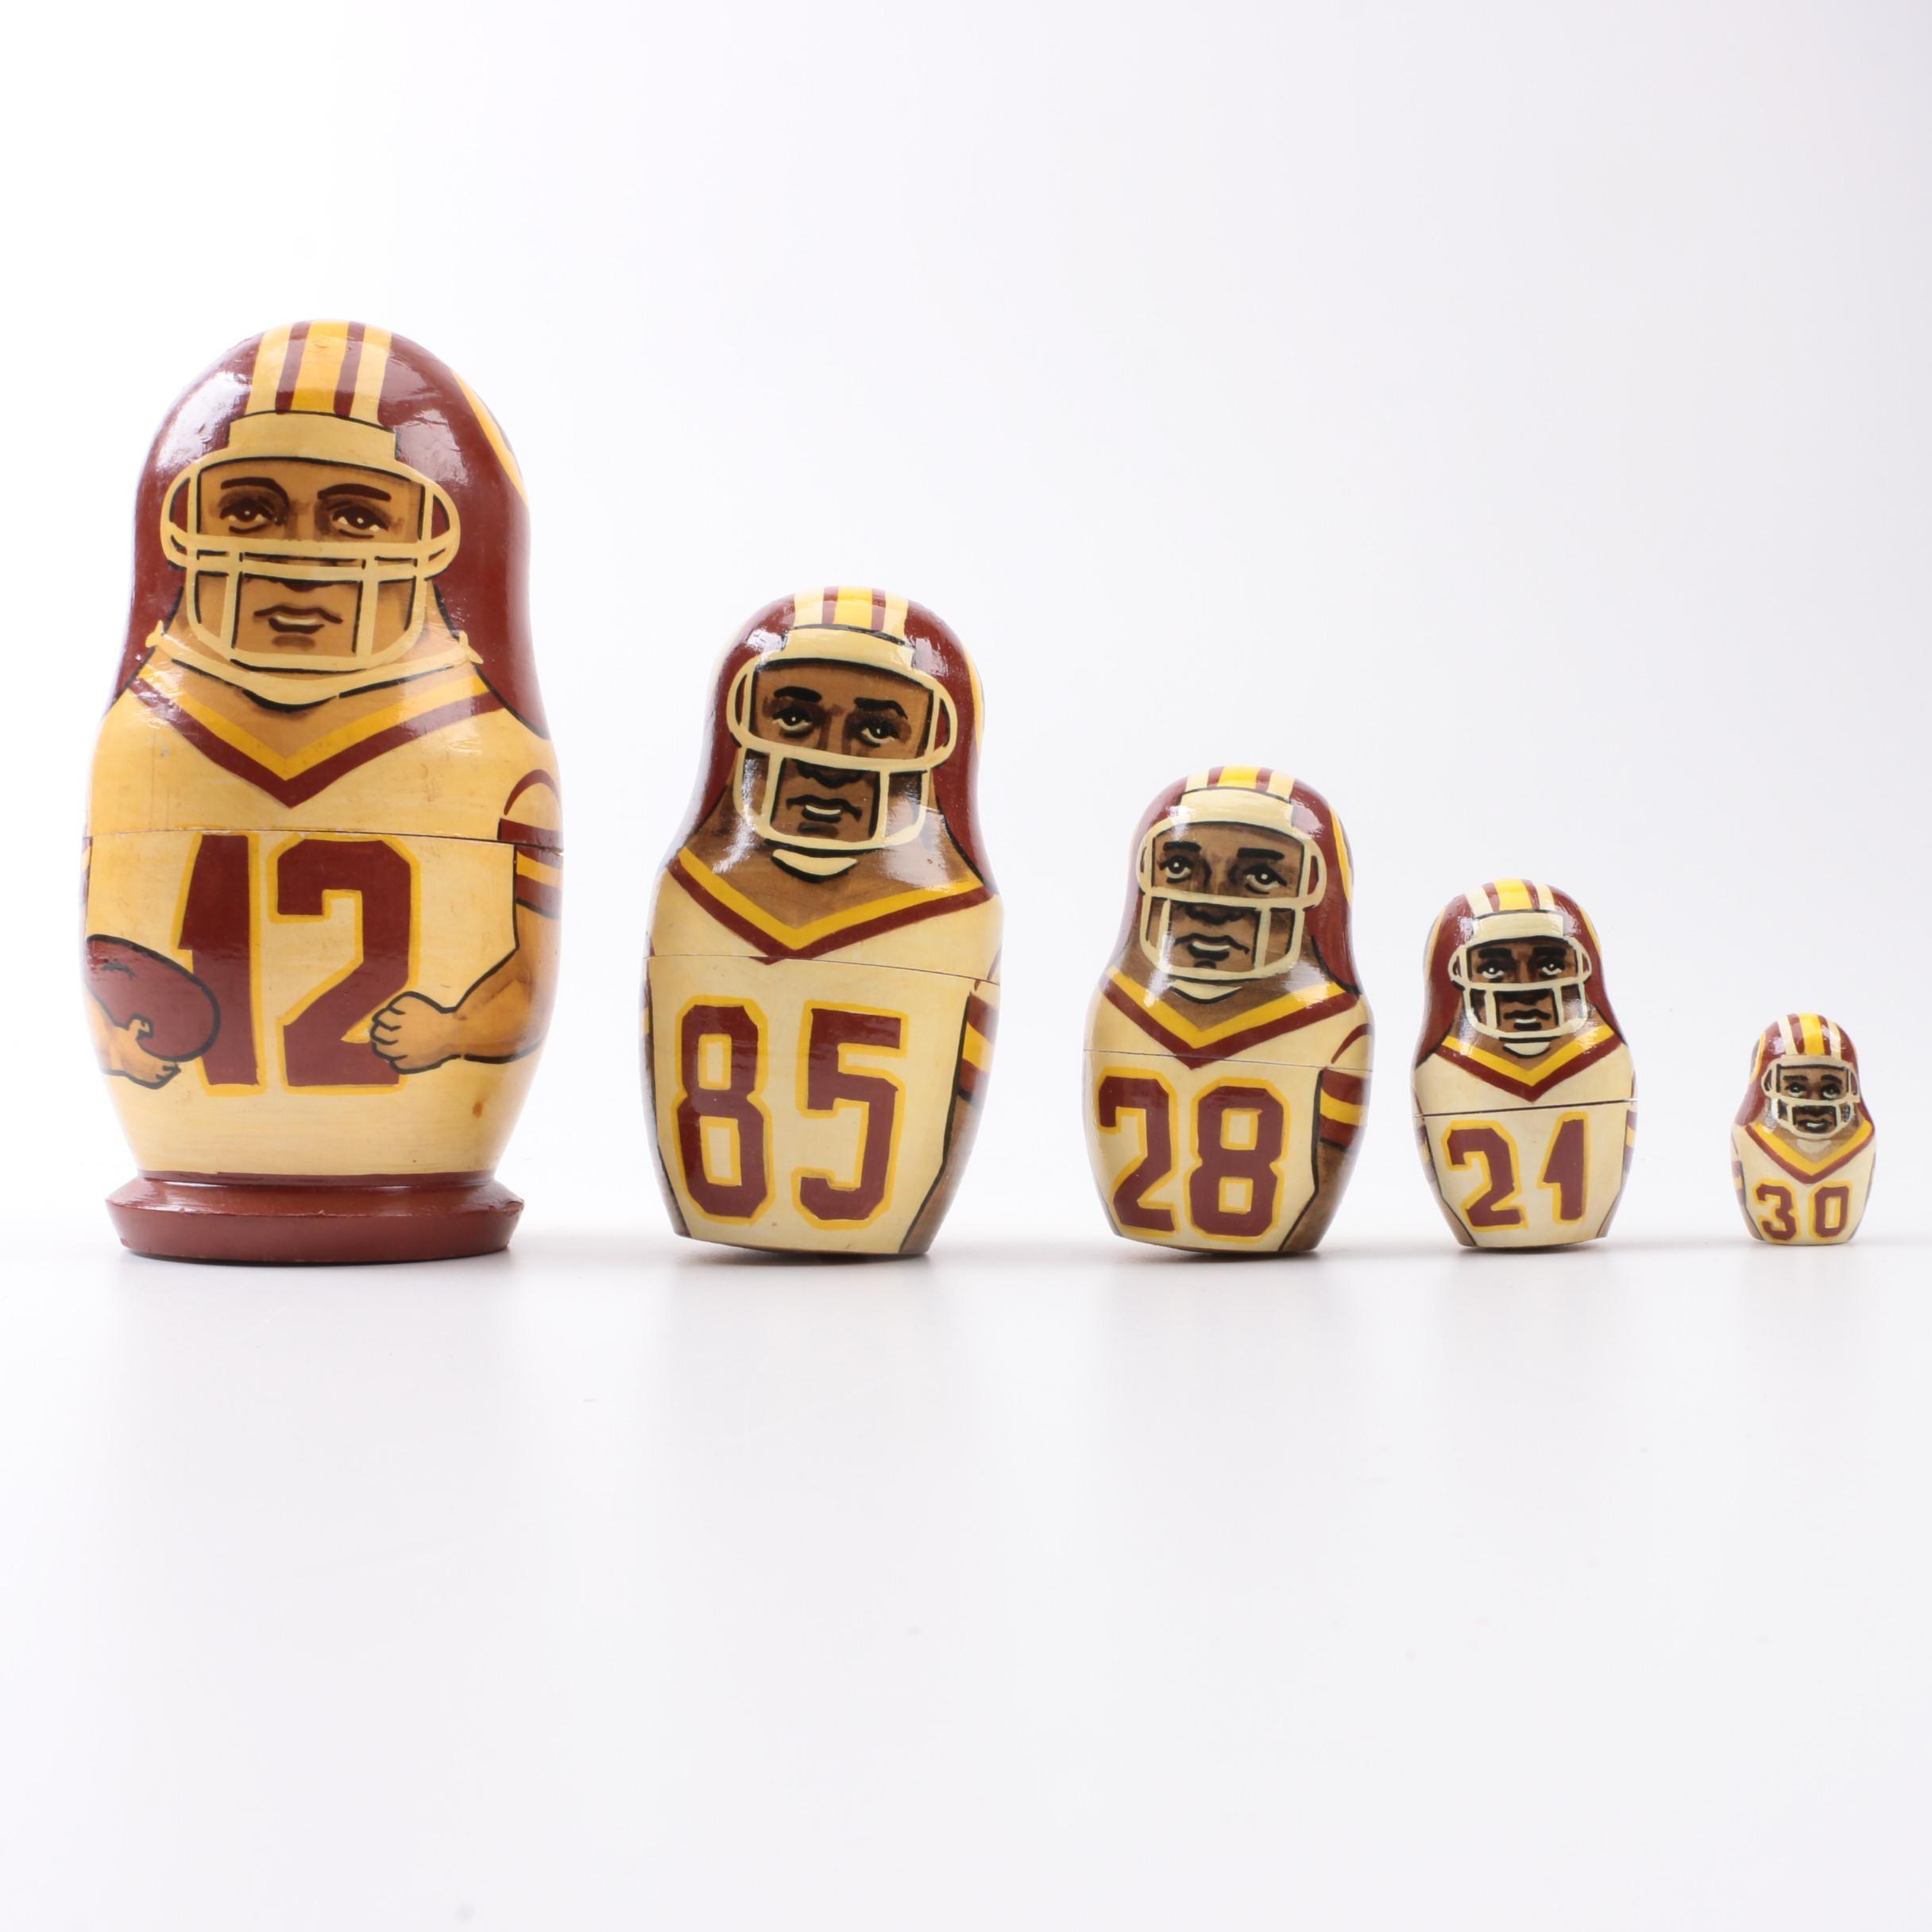 Washington Redskins Matryoshka Doll